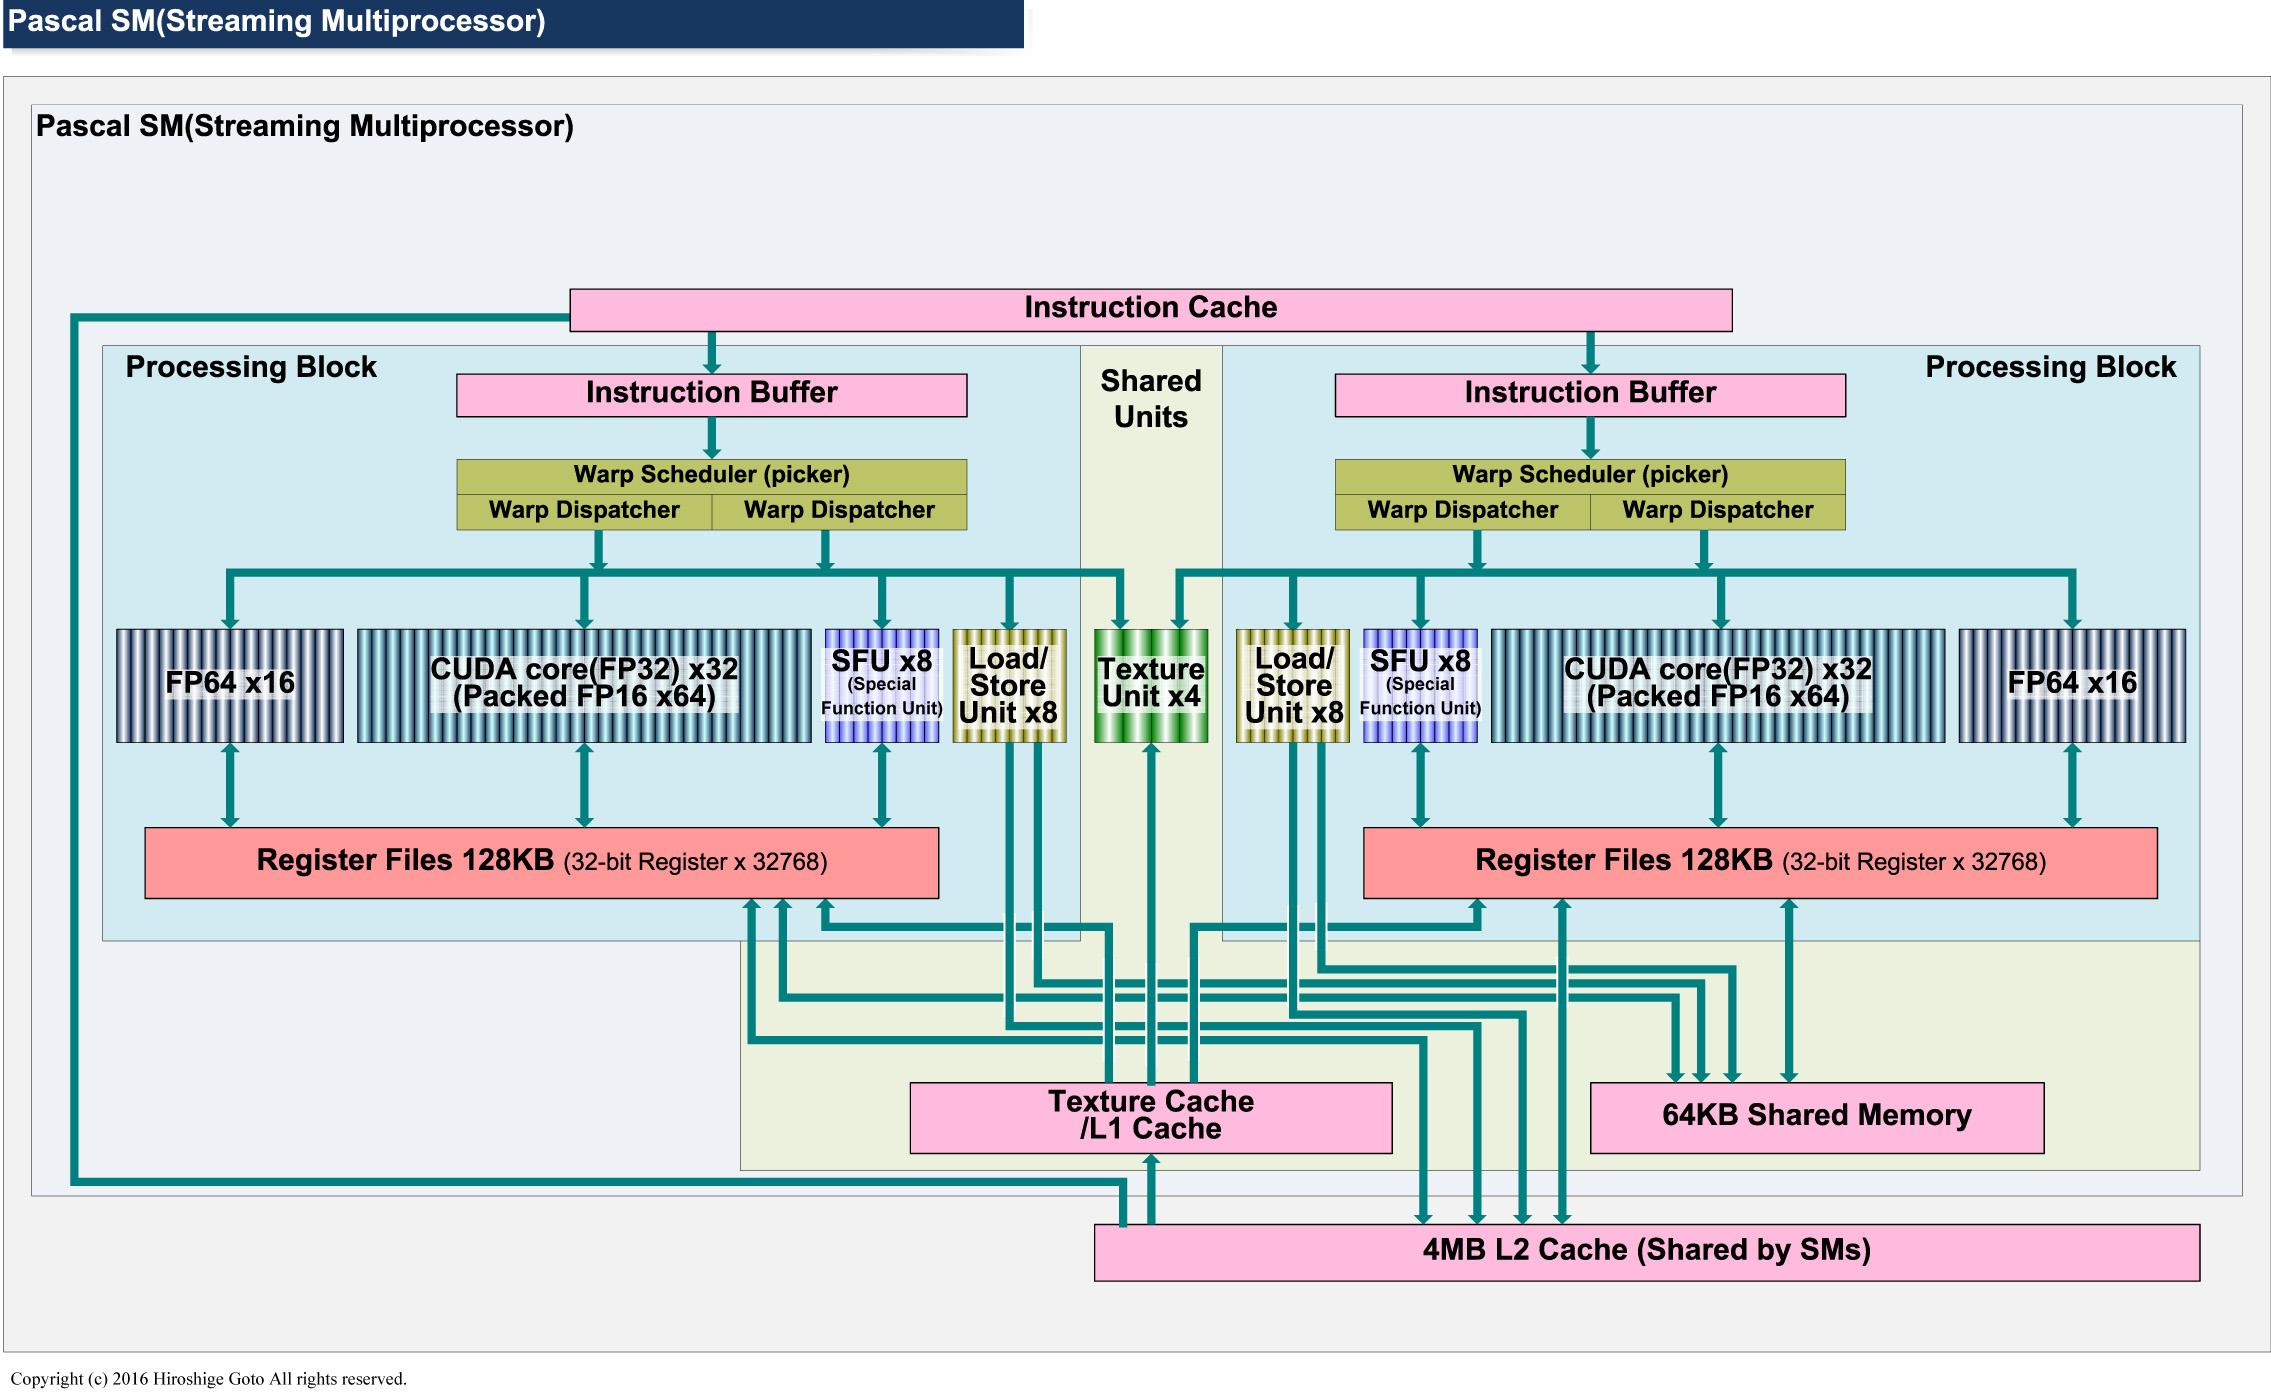 "GP100のSMブロック図<br class="""">PDF版は<span class=""img-inline raw""><a href=""/video/pcw/docs/757/916/p7.pdf"" ipw_status=""1"" ipw_linktype=""filelink_raw"" class=""resource"">こちら</a></span>"